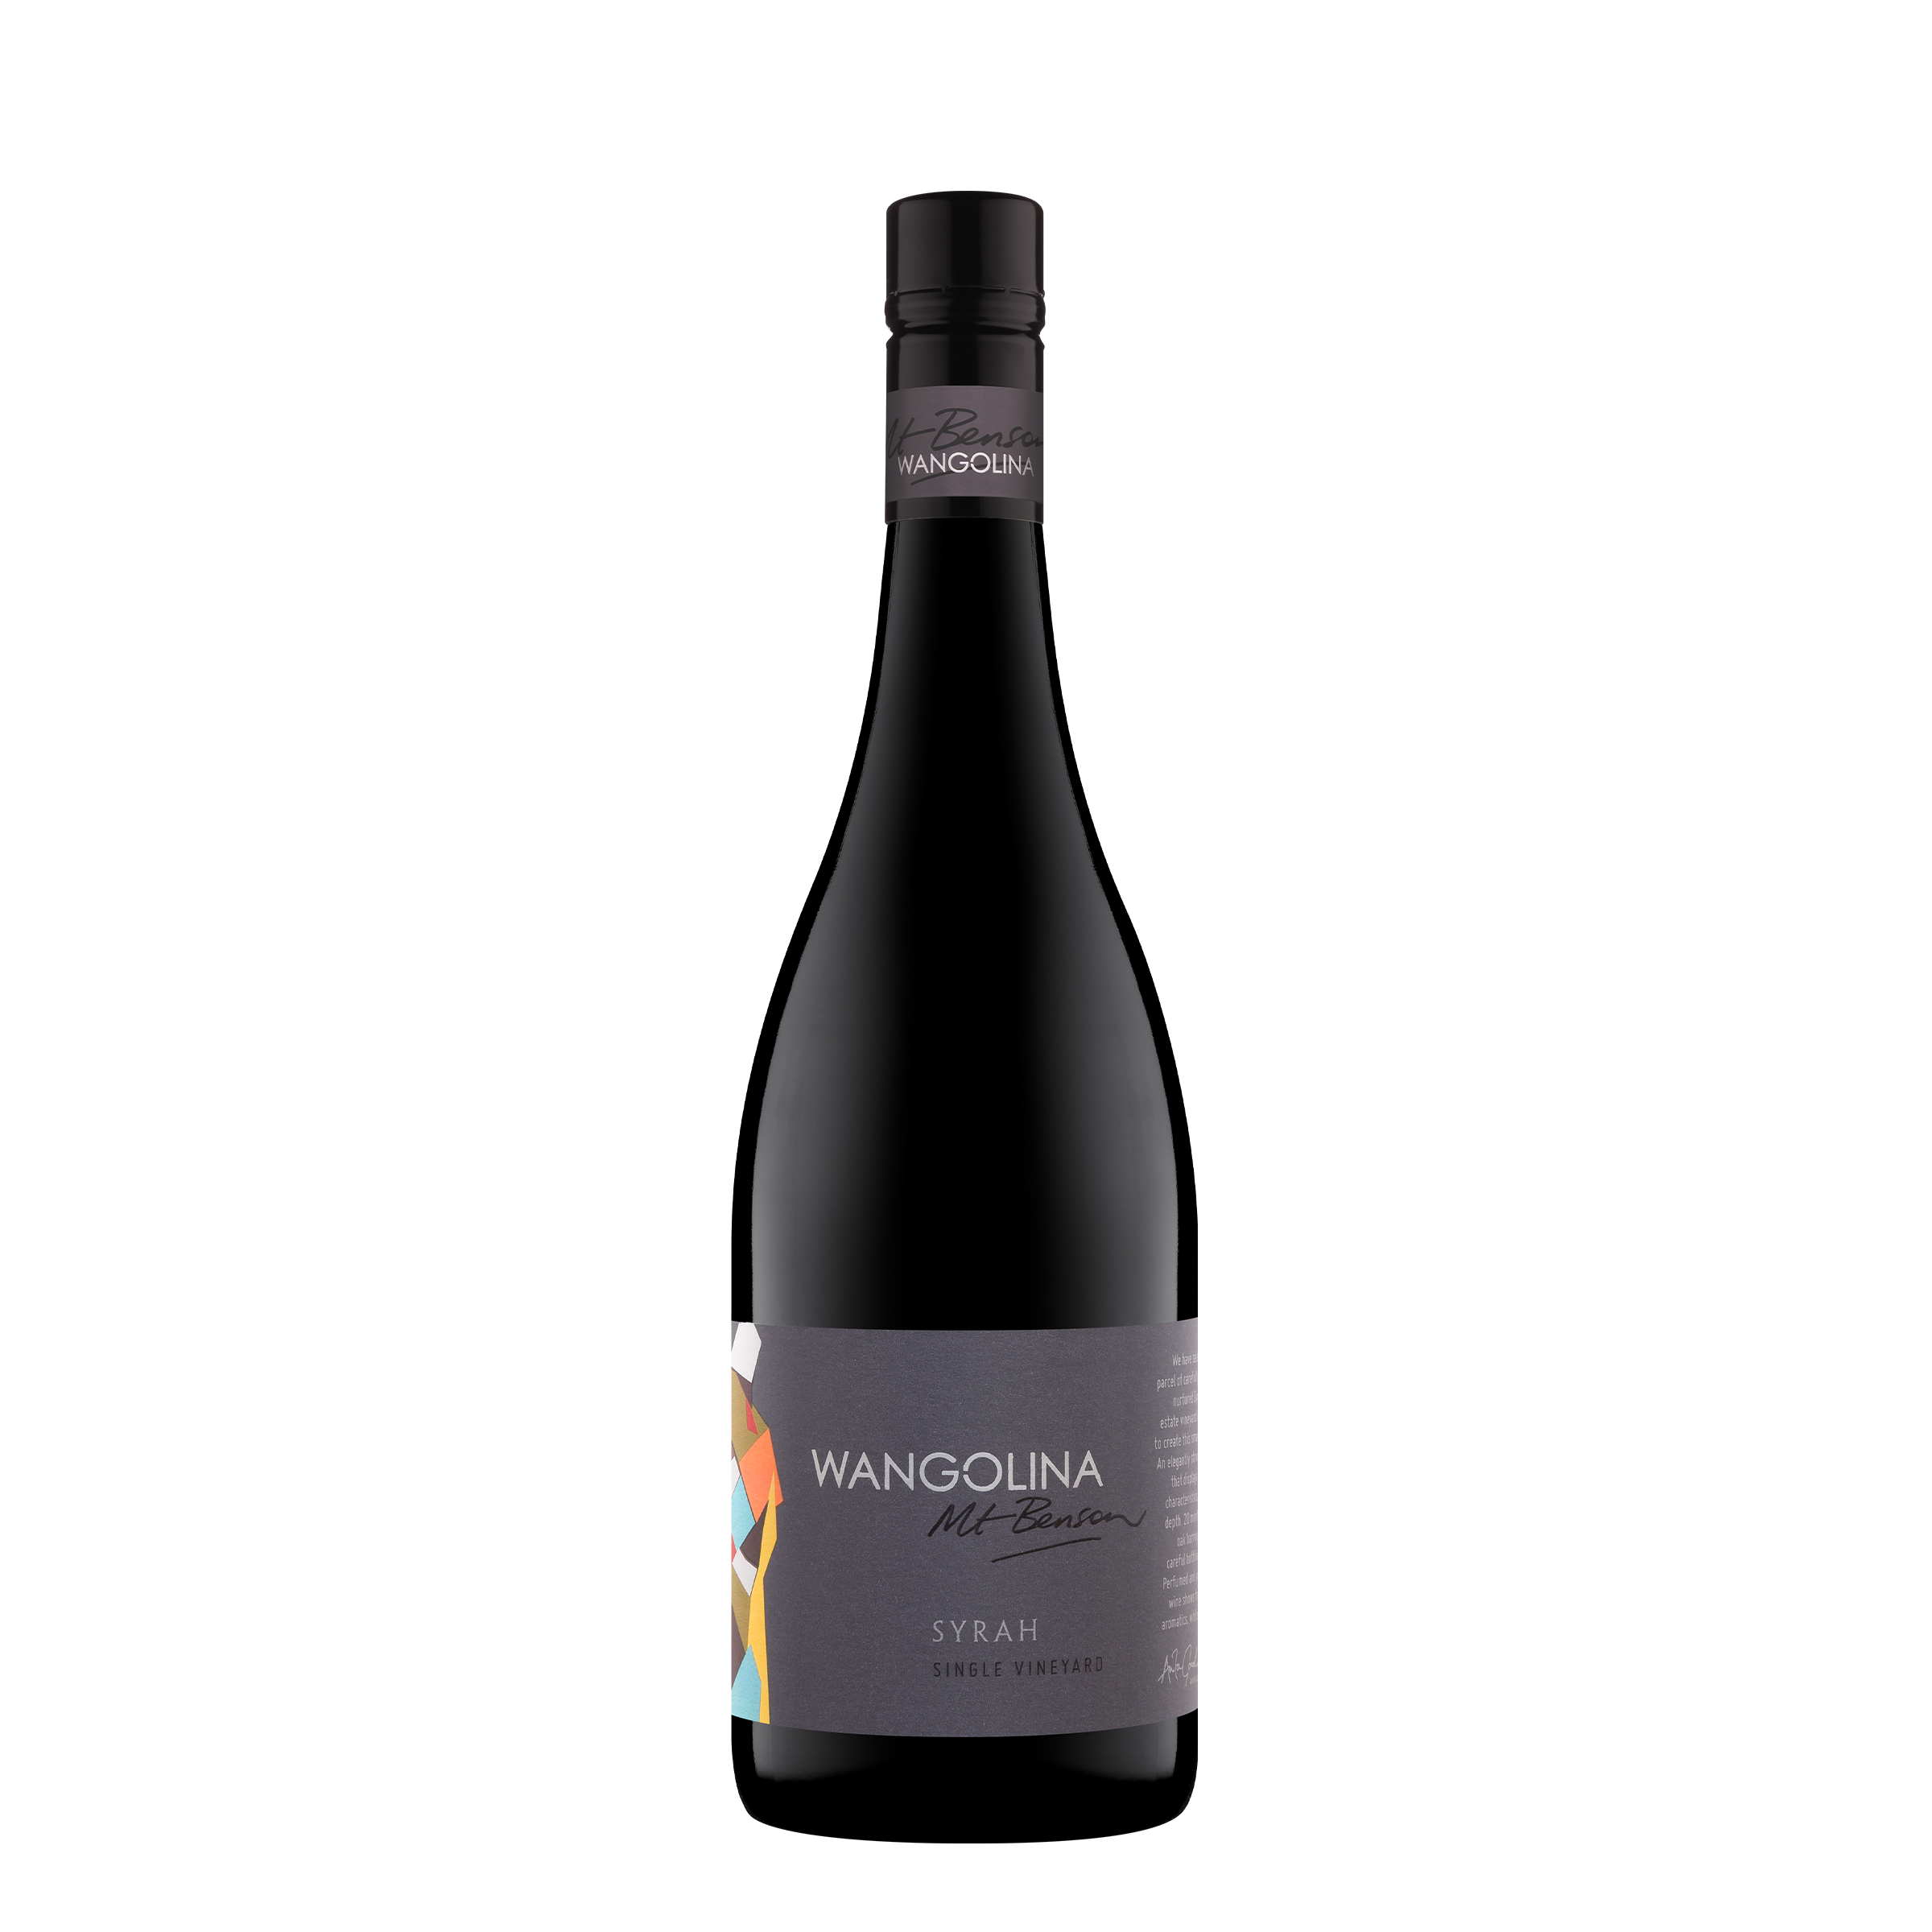 Wangolina Single Vineyard Syrah 750ml 2015